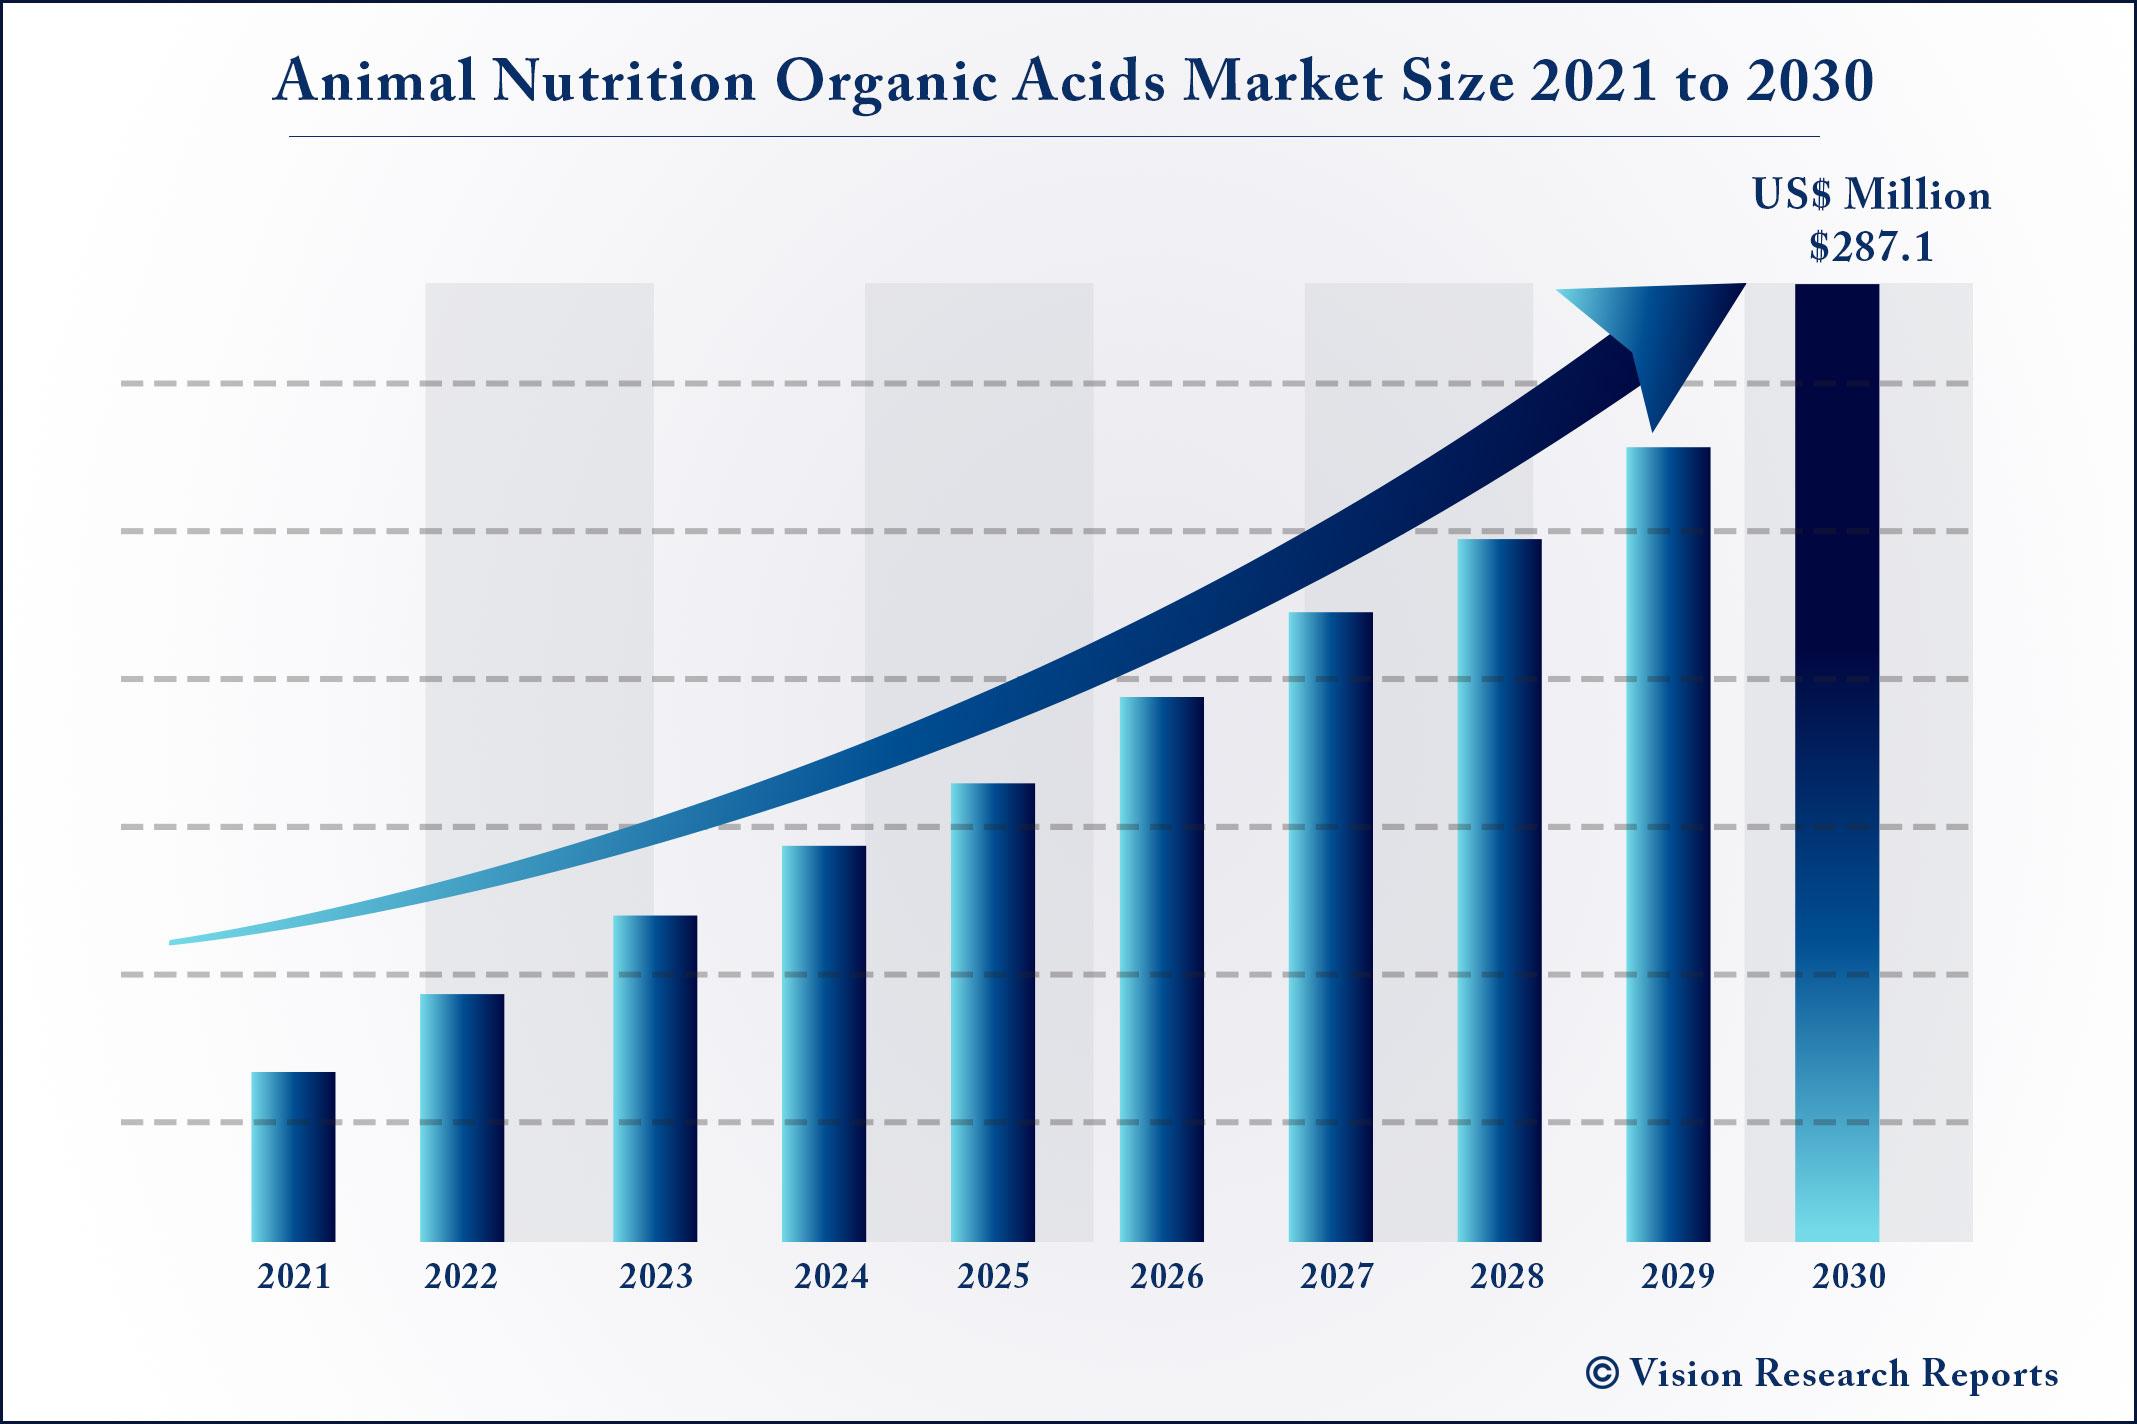 Animal Nutrition Organic Acids Market Size 2021 to 2030